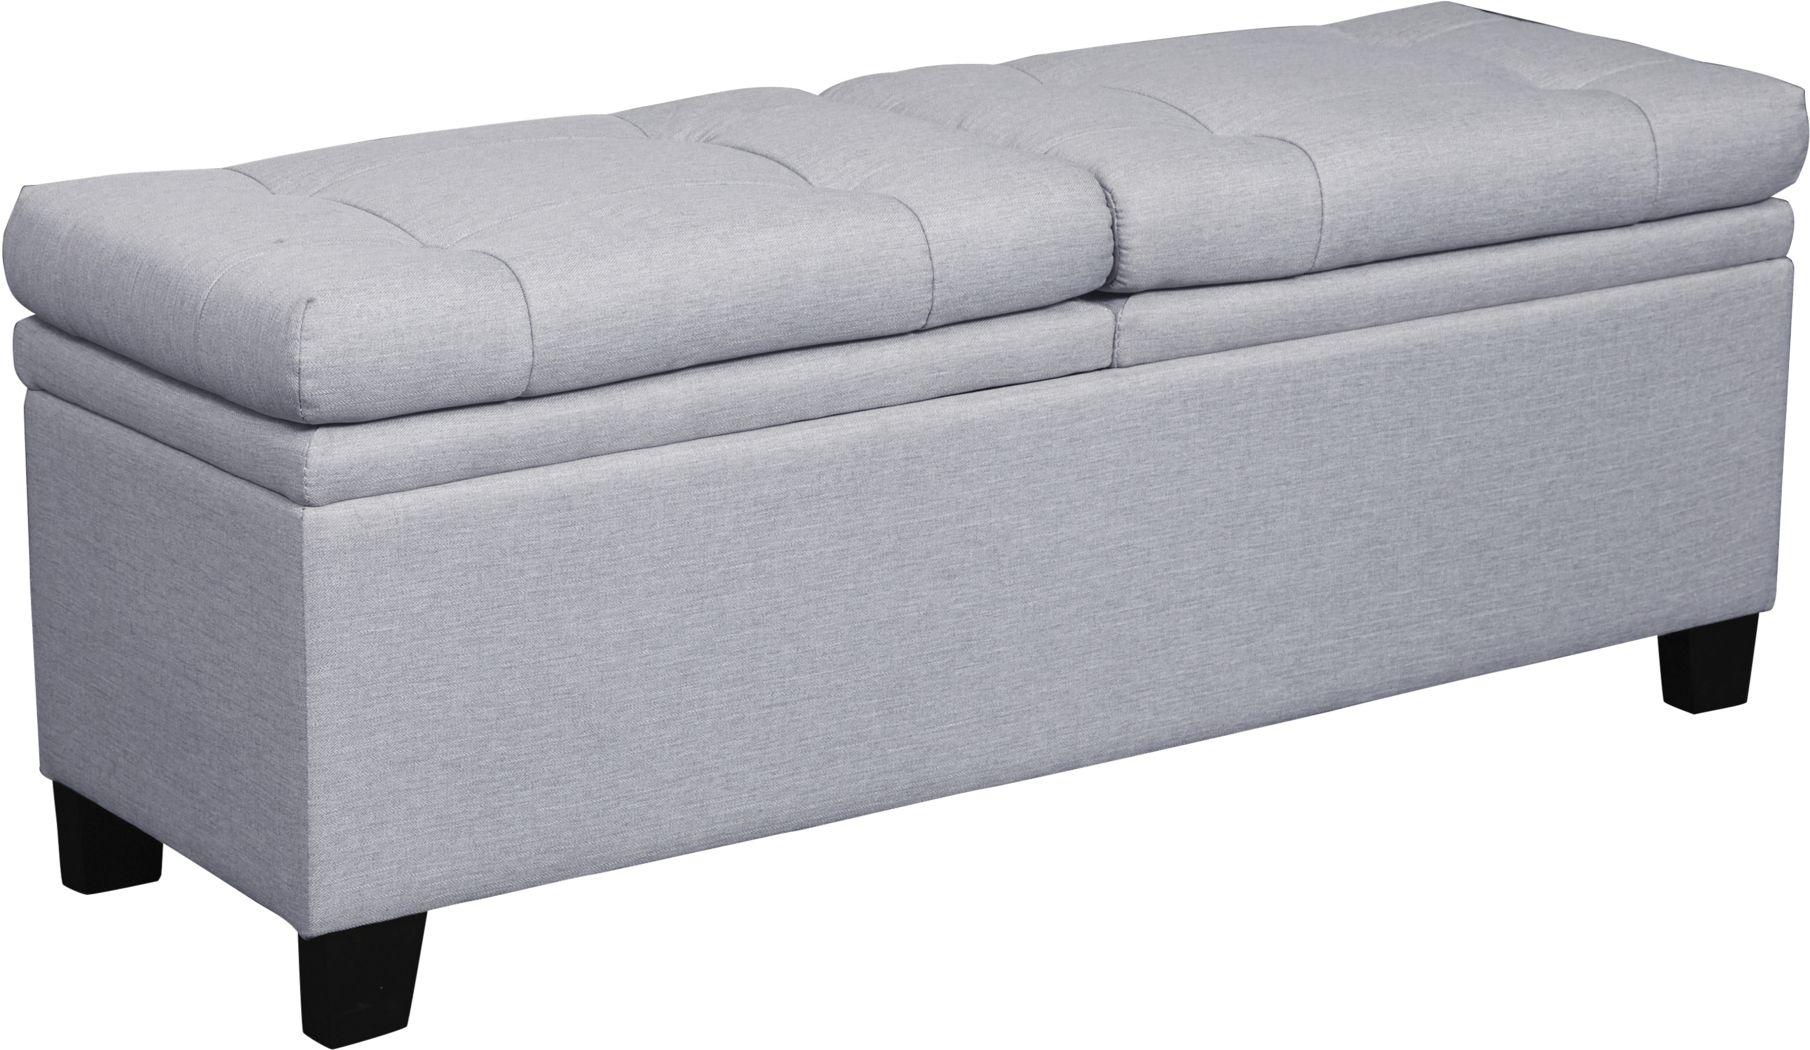 Marmor Gray Storage Bench